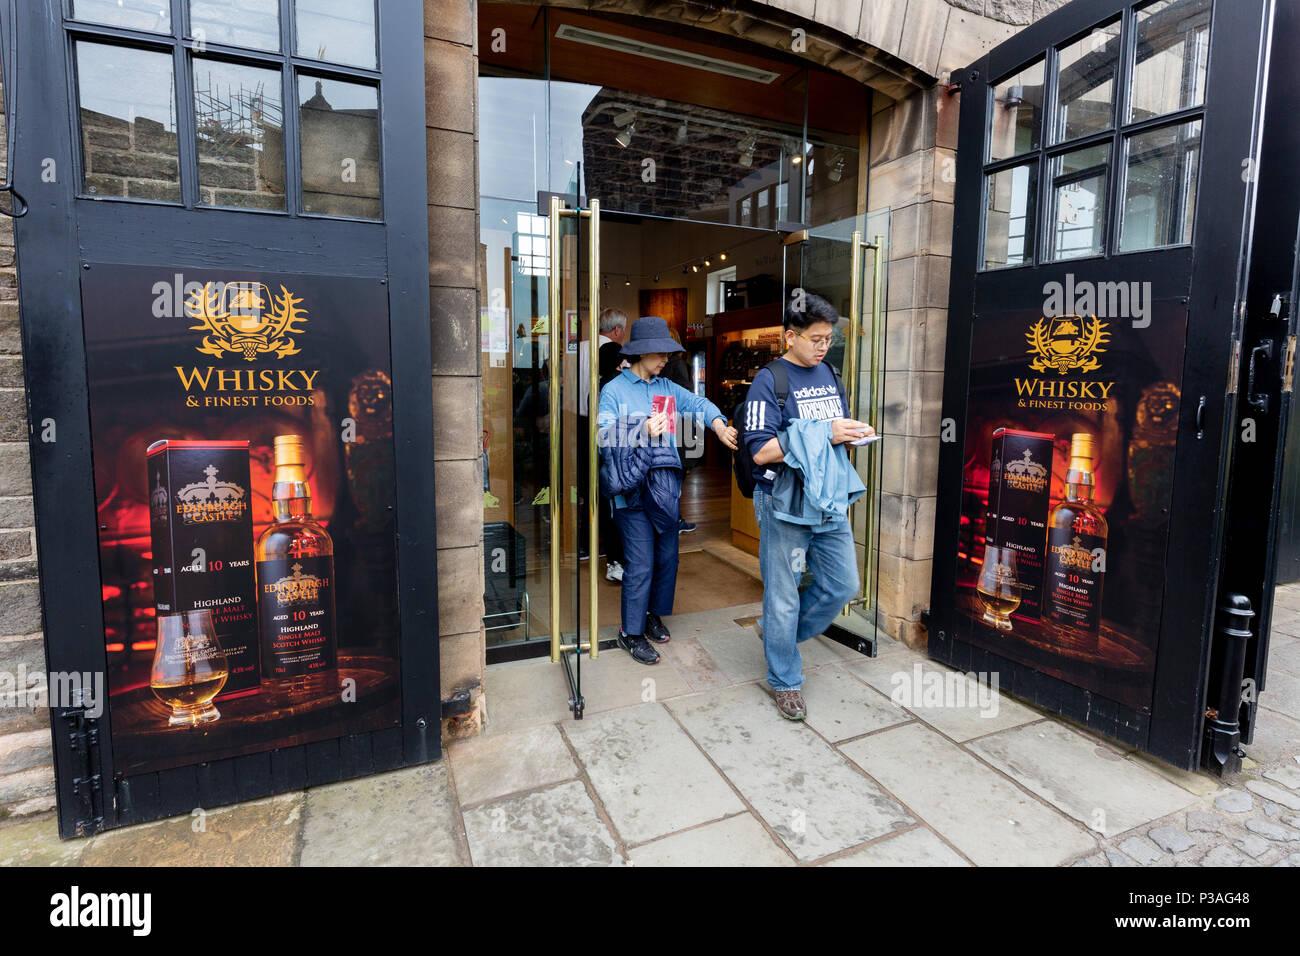 The Scottish Whisky Gift Shop, Edinburgh Castle, Edinburgh, Scotland UK - Stock Image